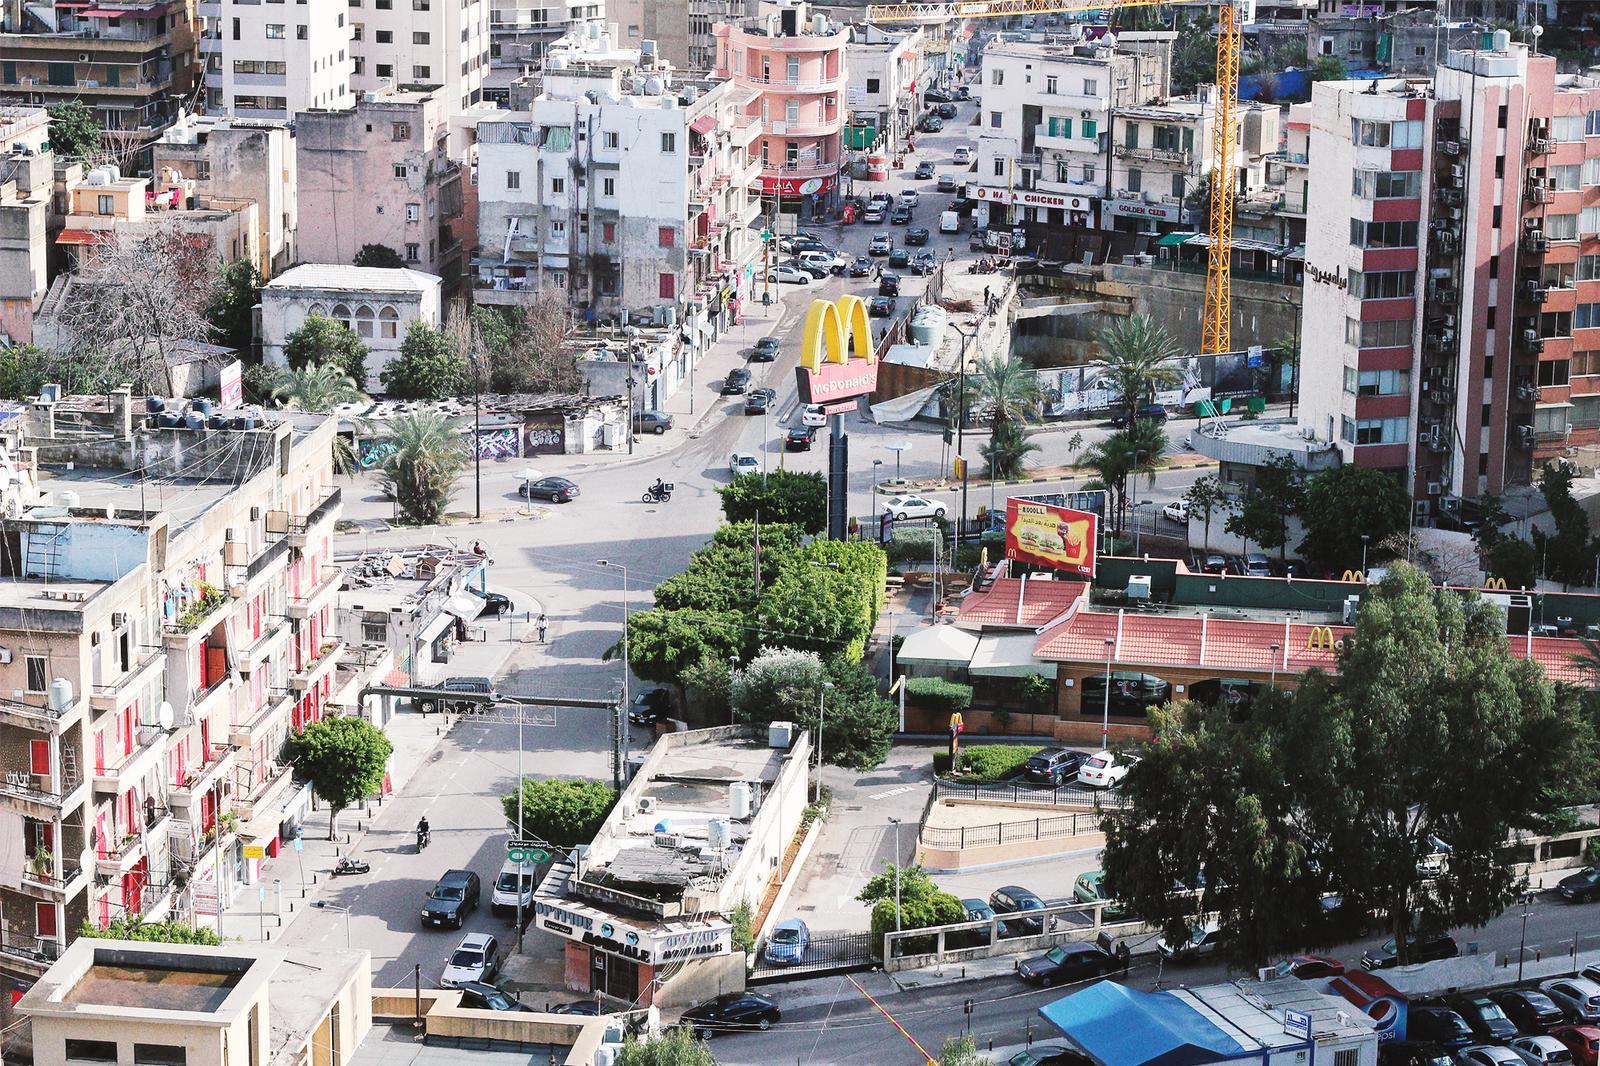 Beirut McDonalds